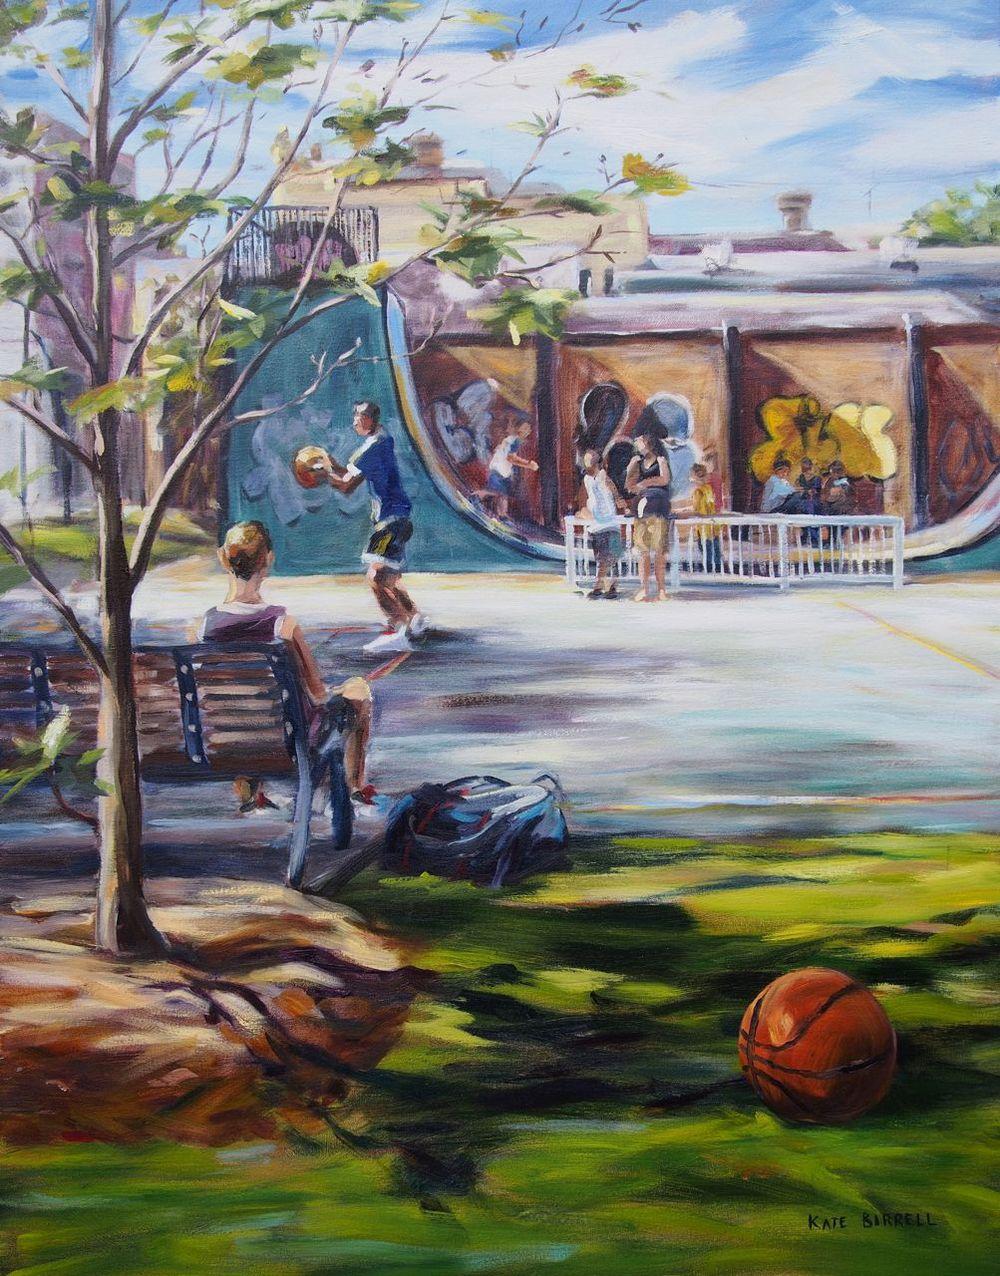 Oil on Canvas 76cmW x 100cmH sold 2014